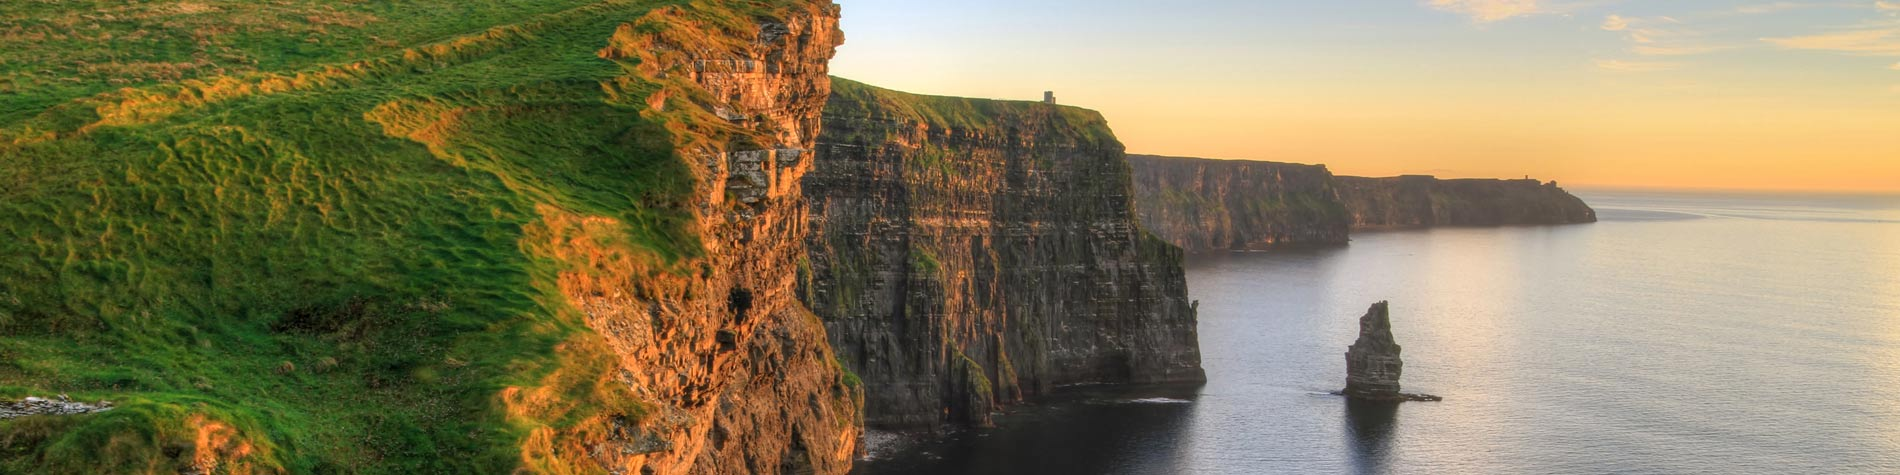 Cheap Flights To Ireland From 163 9 98 Ryanair Com